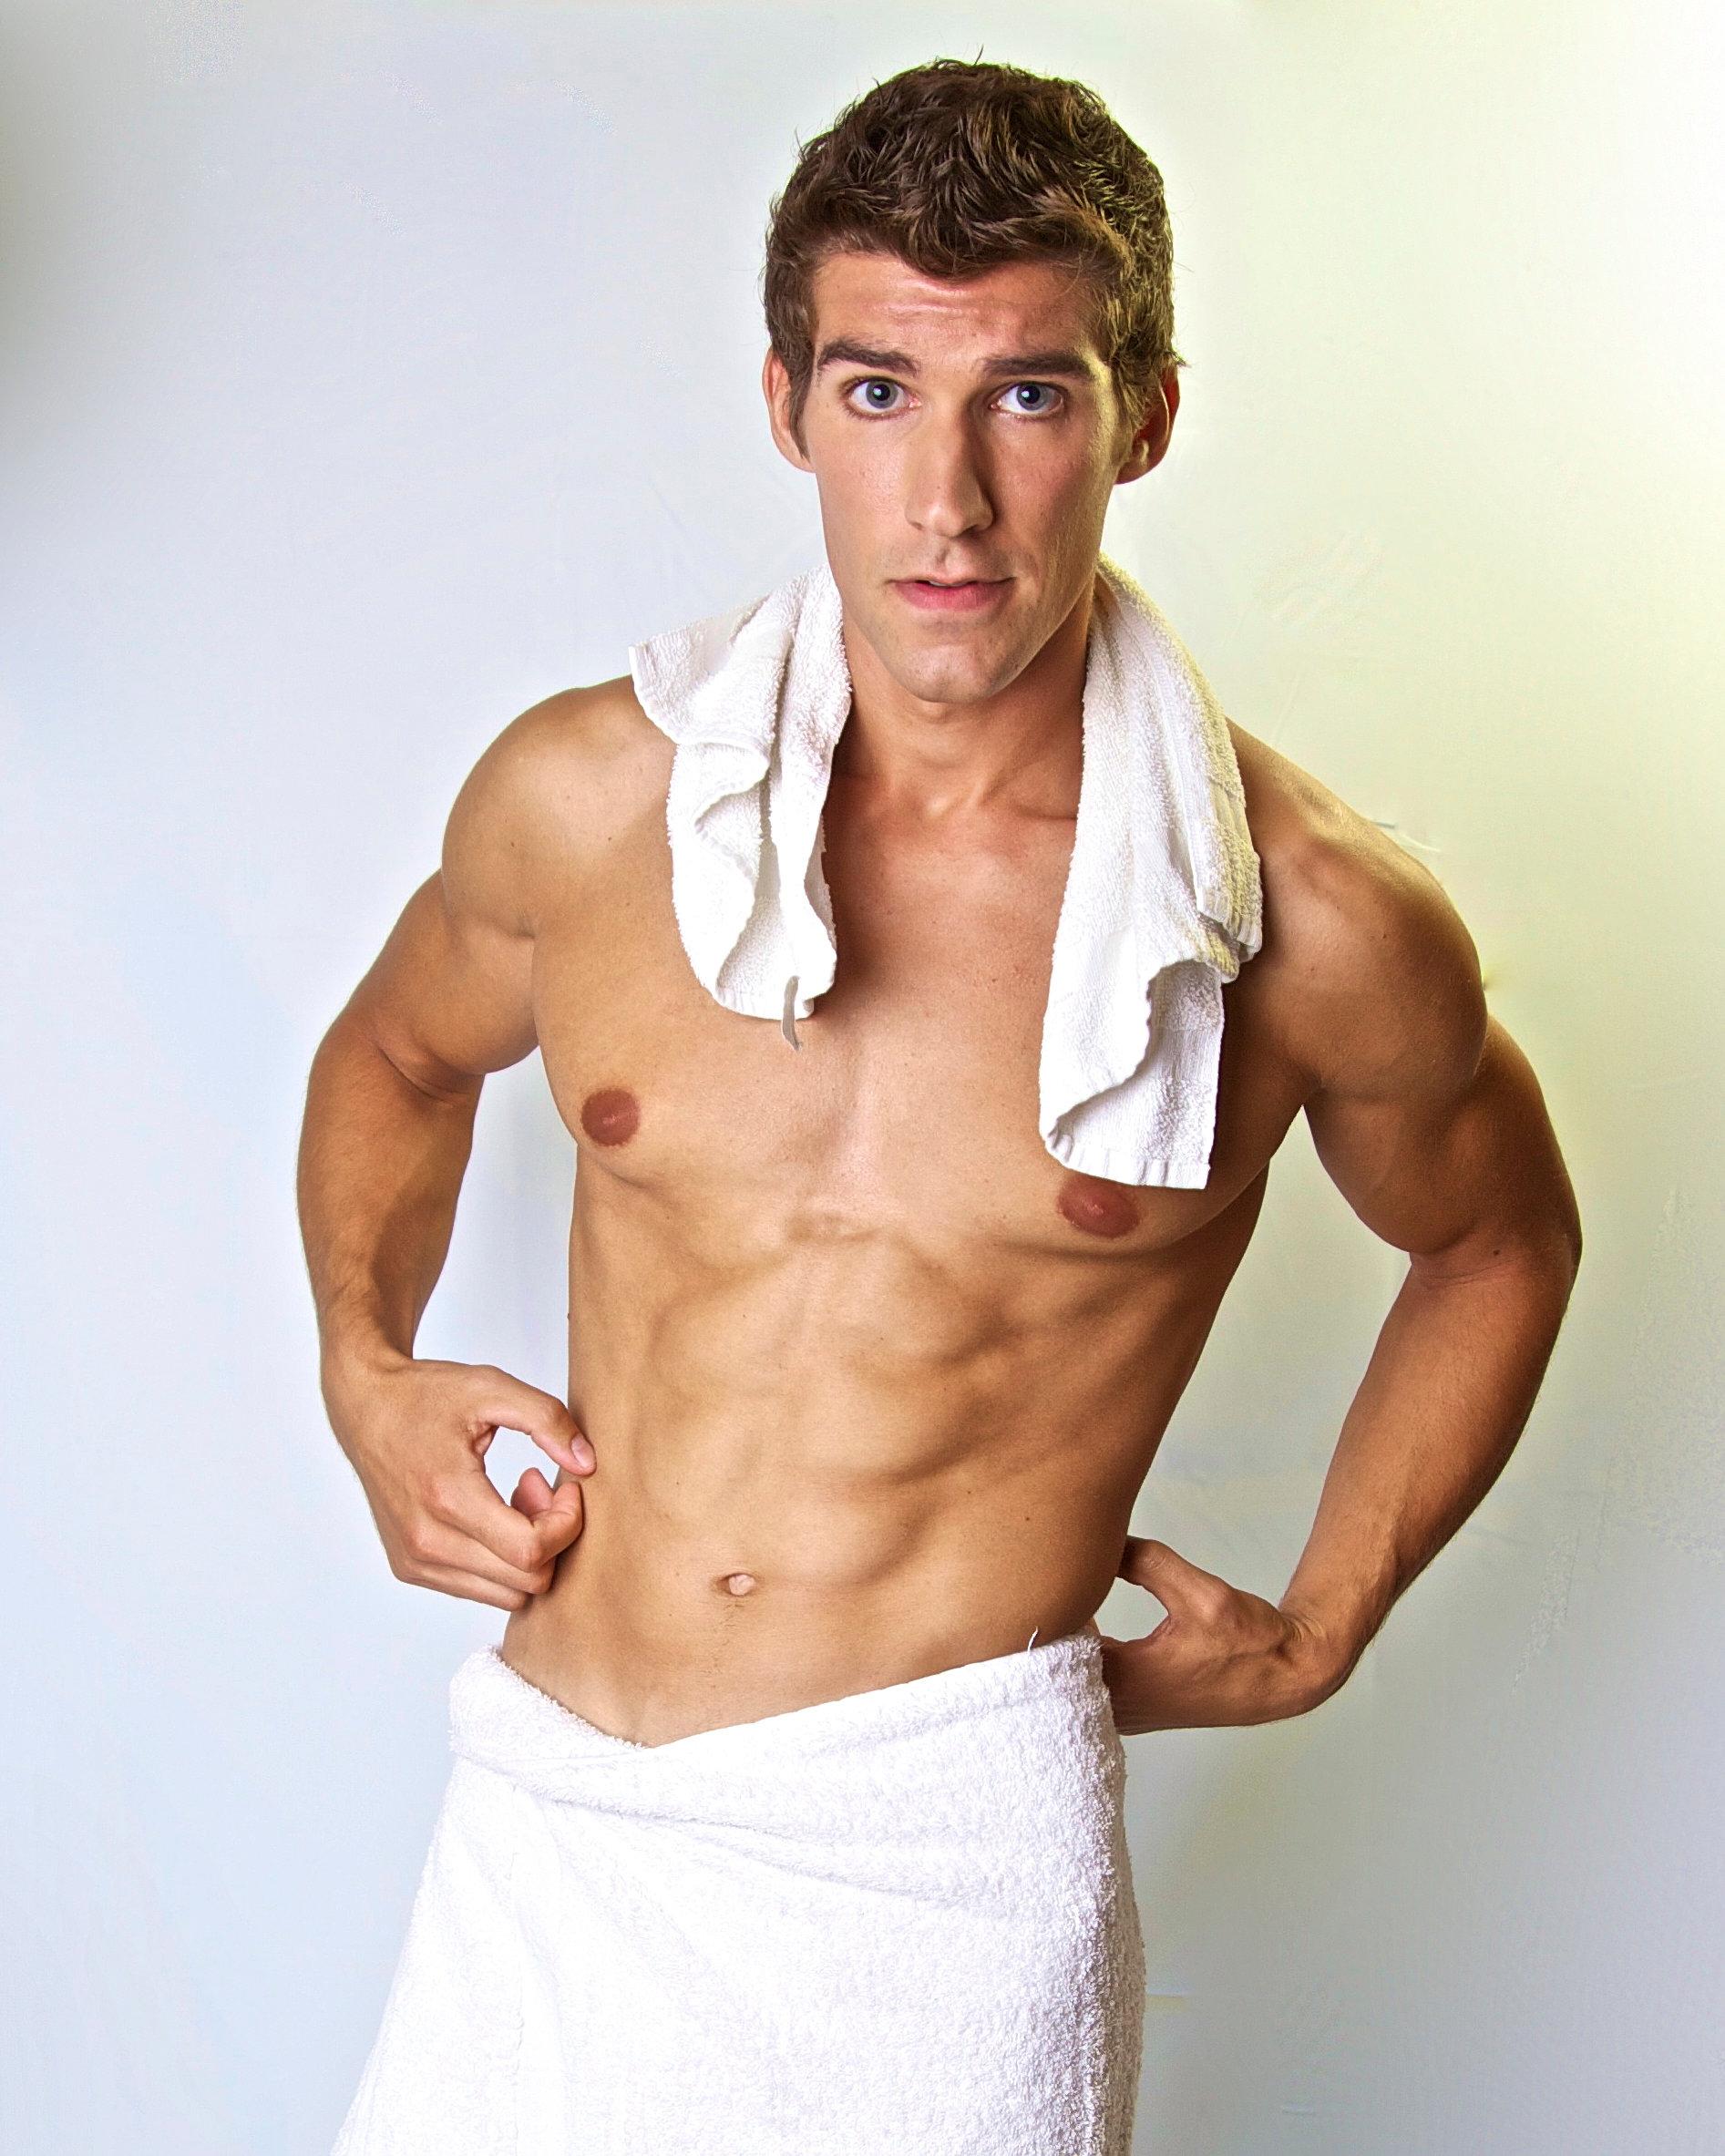 Spanish guys nude in public outdoor gay 8